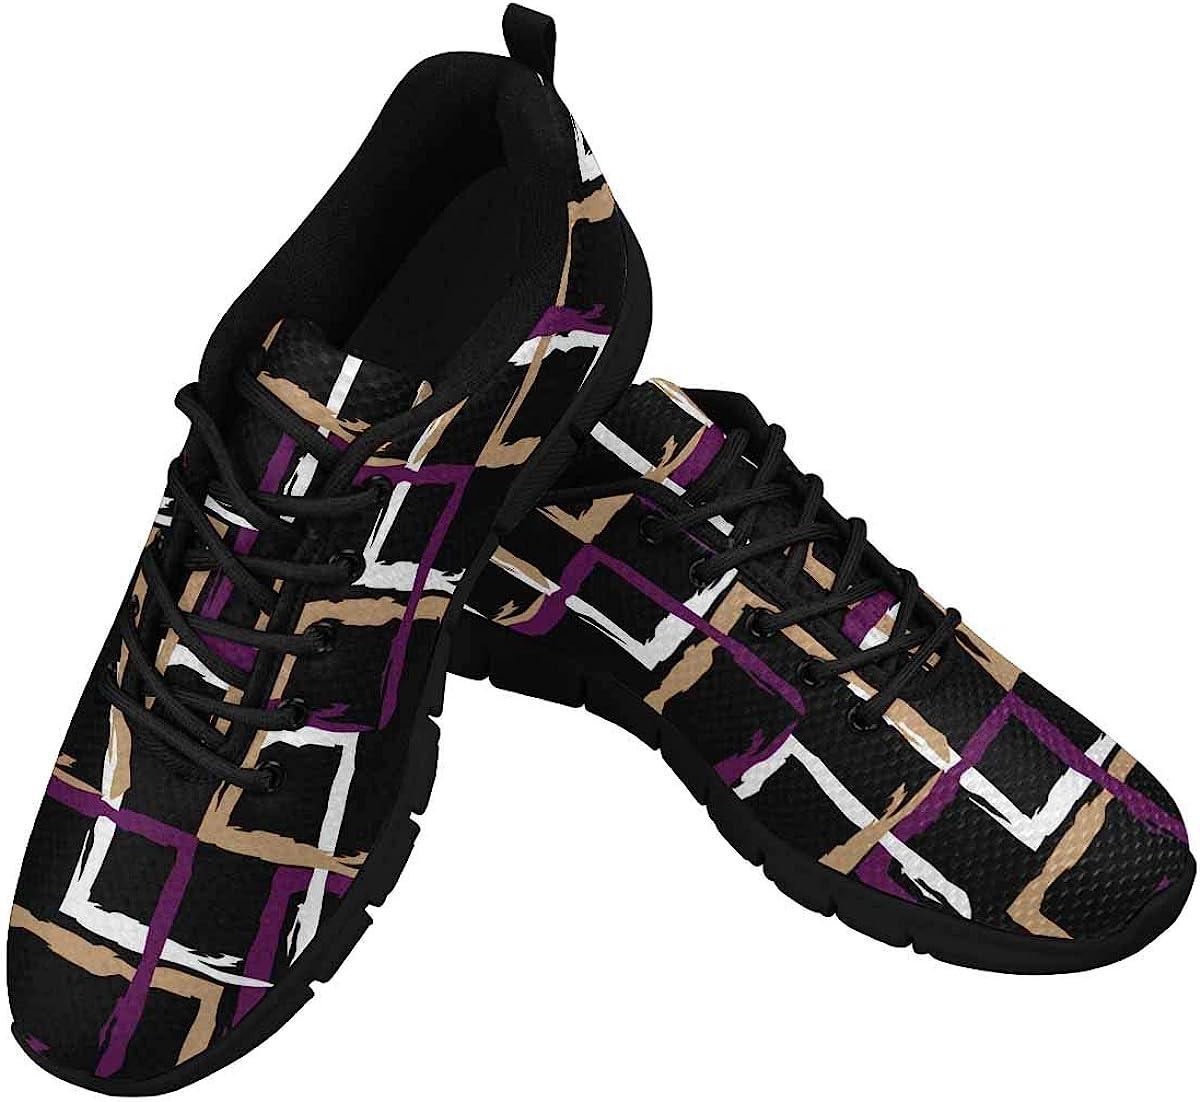 INTERESTPRINT Black Purple White Pattern Women's Athletic Walking Shoes Comfort Mesh Non Slip